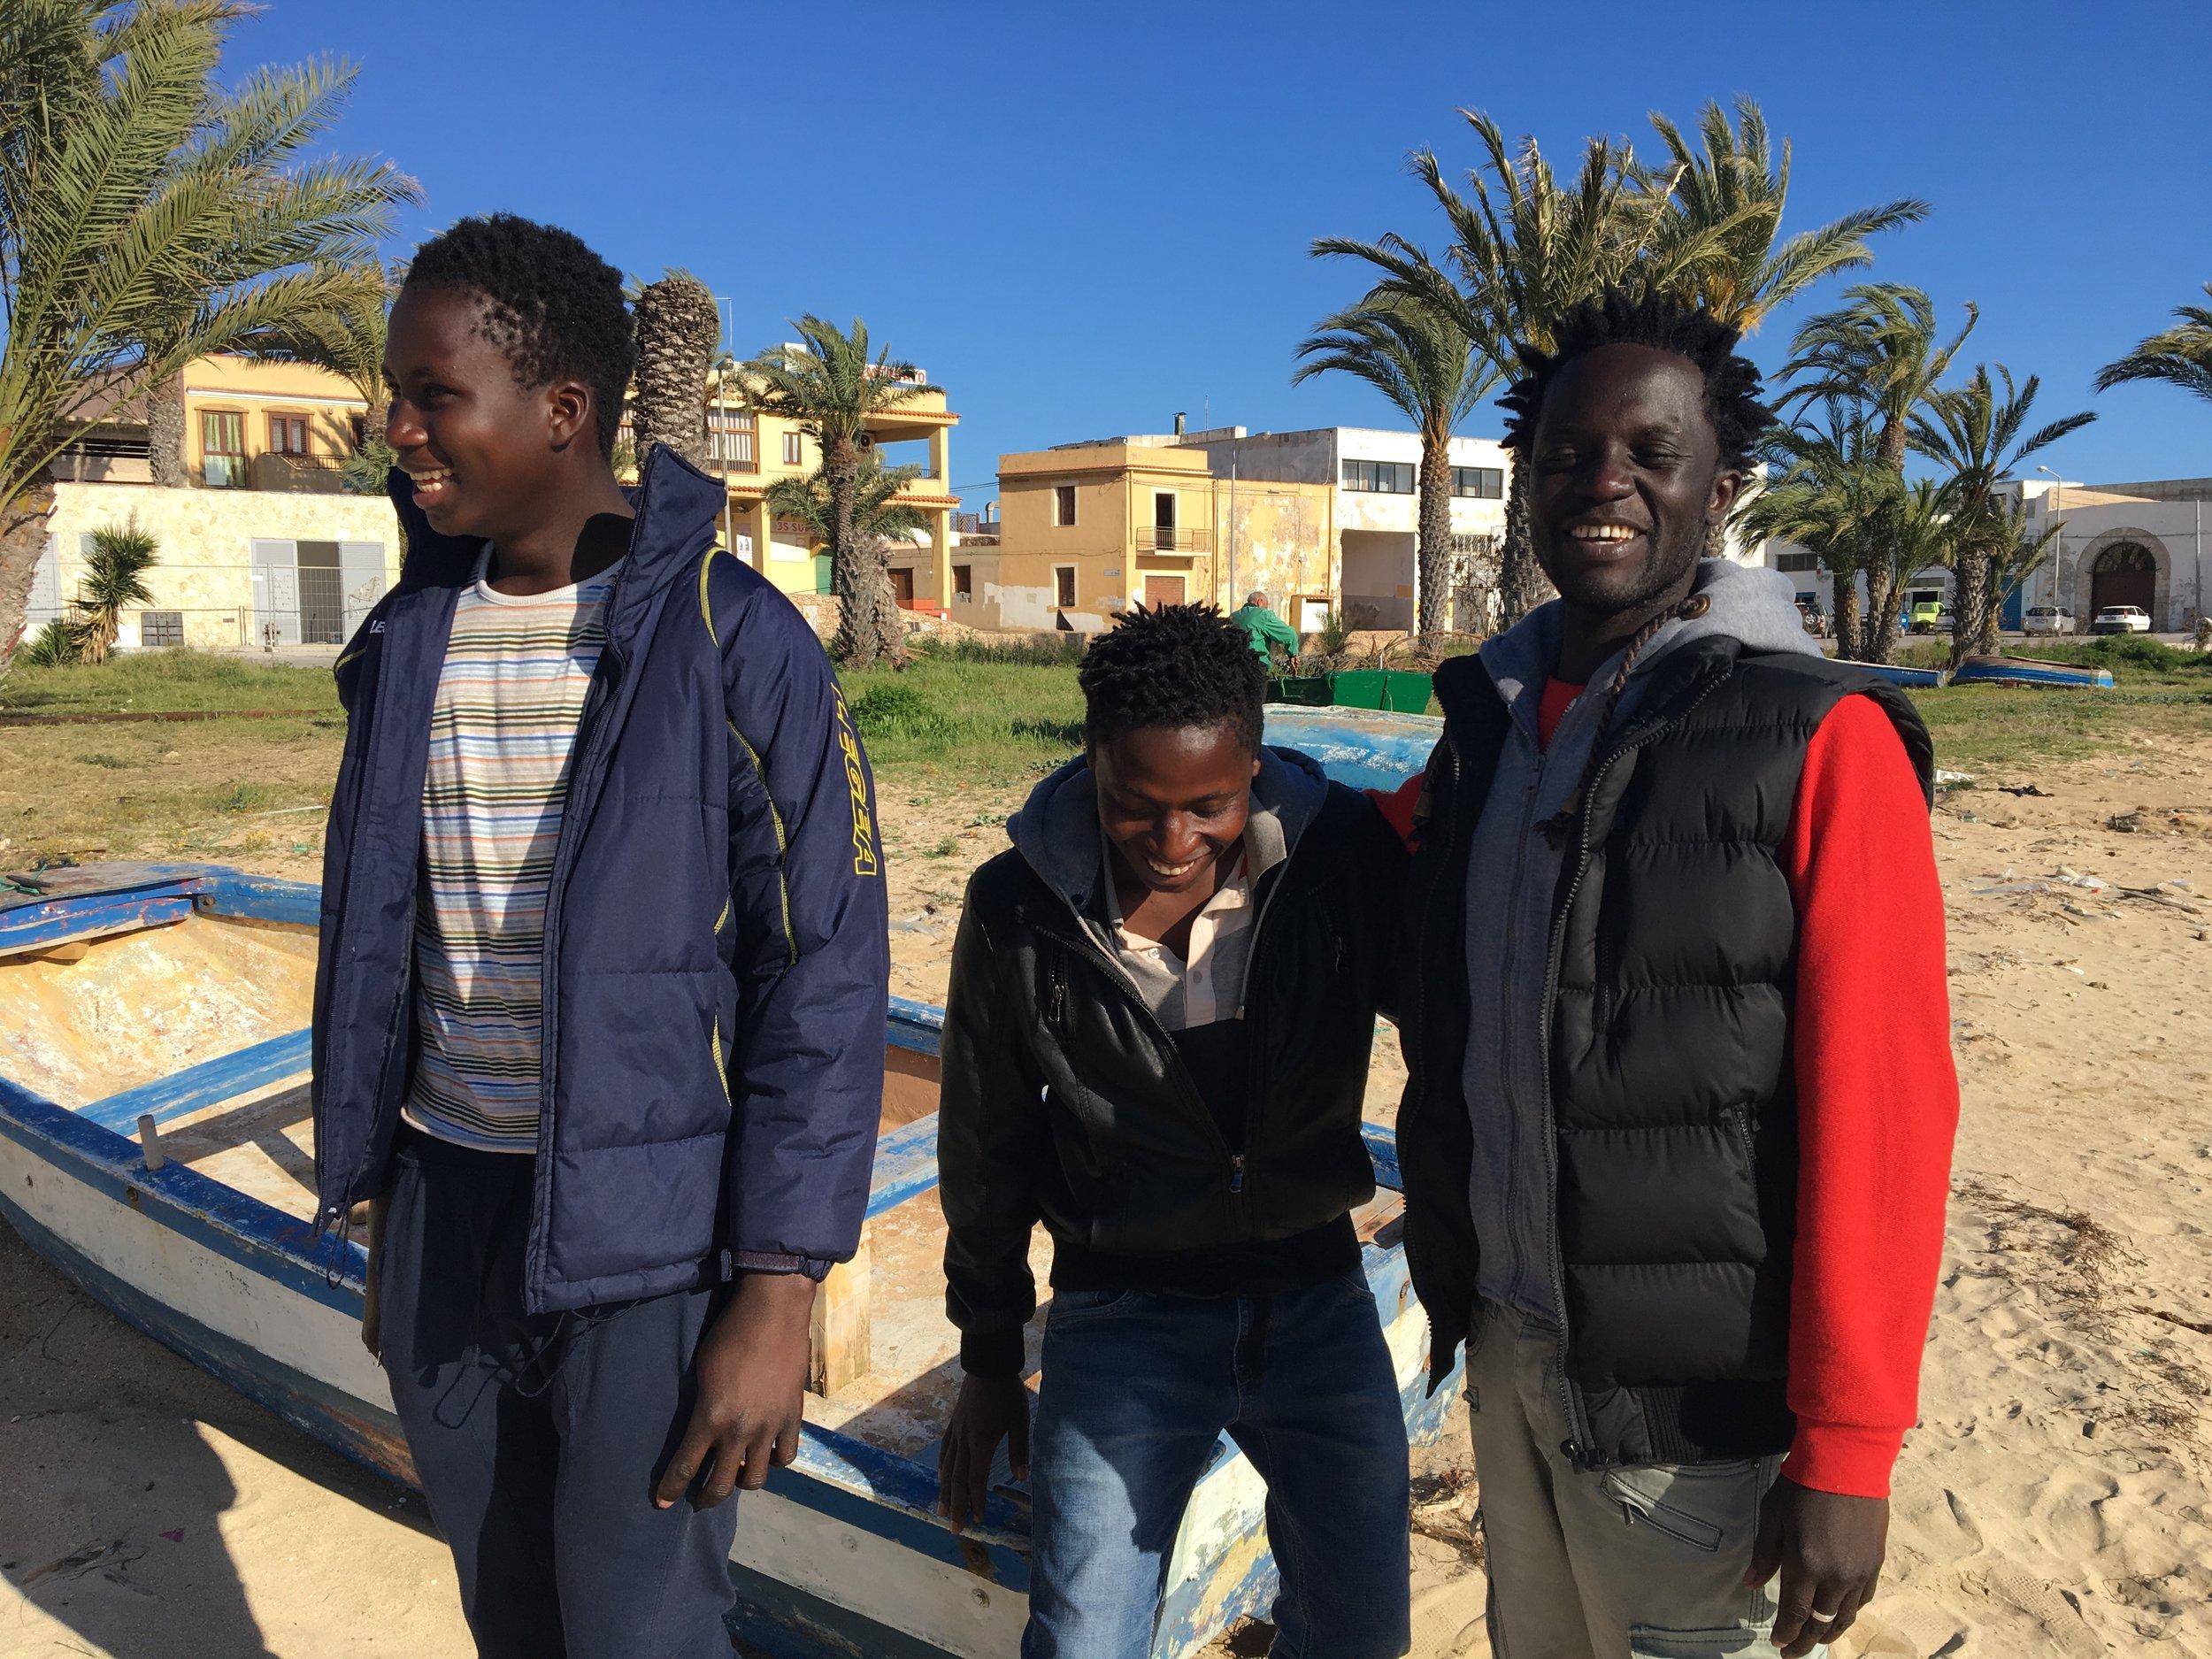 Ebrima (L) at Cala Palme; Lampedusa, Italy. 3 April 2017. © Pamela Kerpius